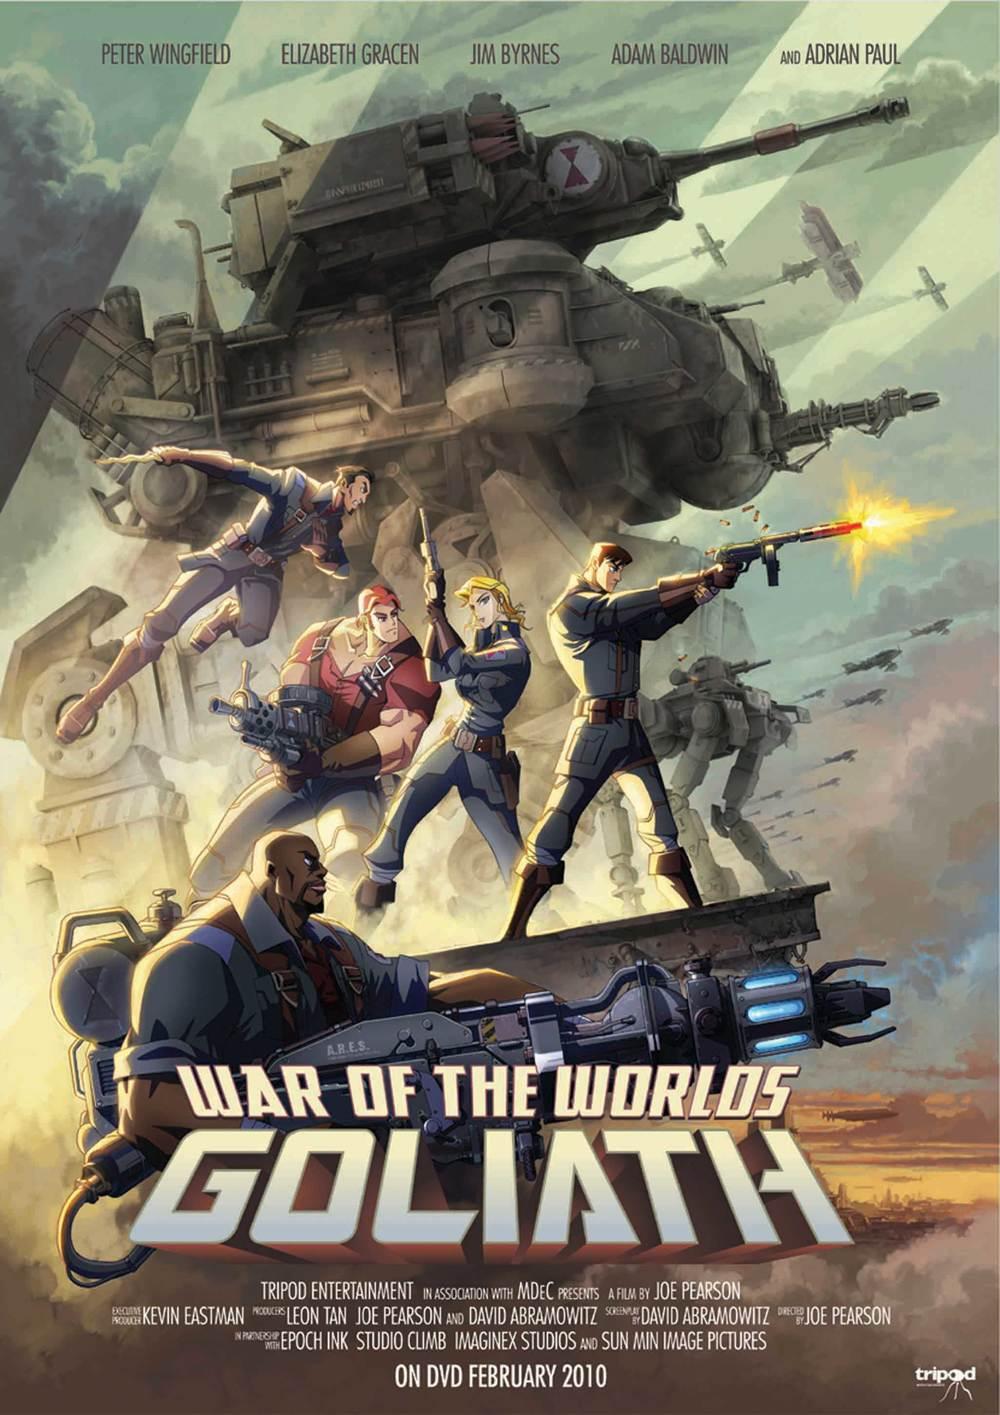 war-of-the-worlds-goliath-must-watch-trailer.jpg